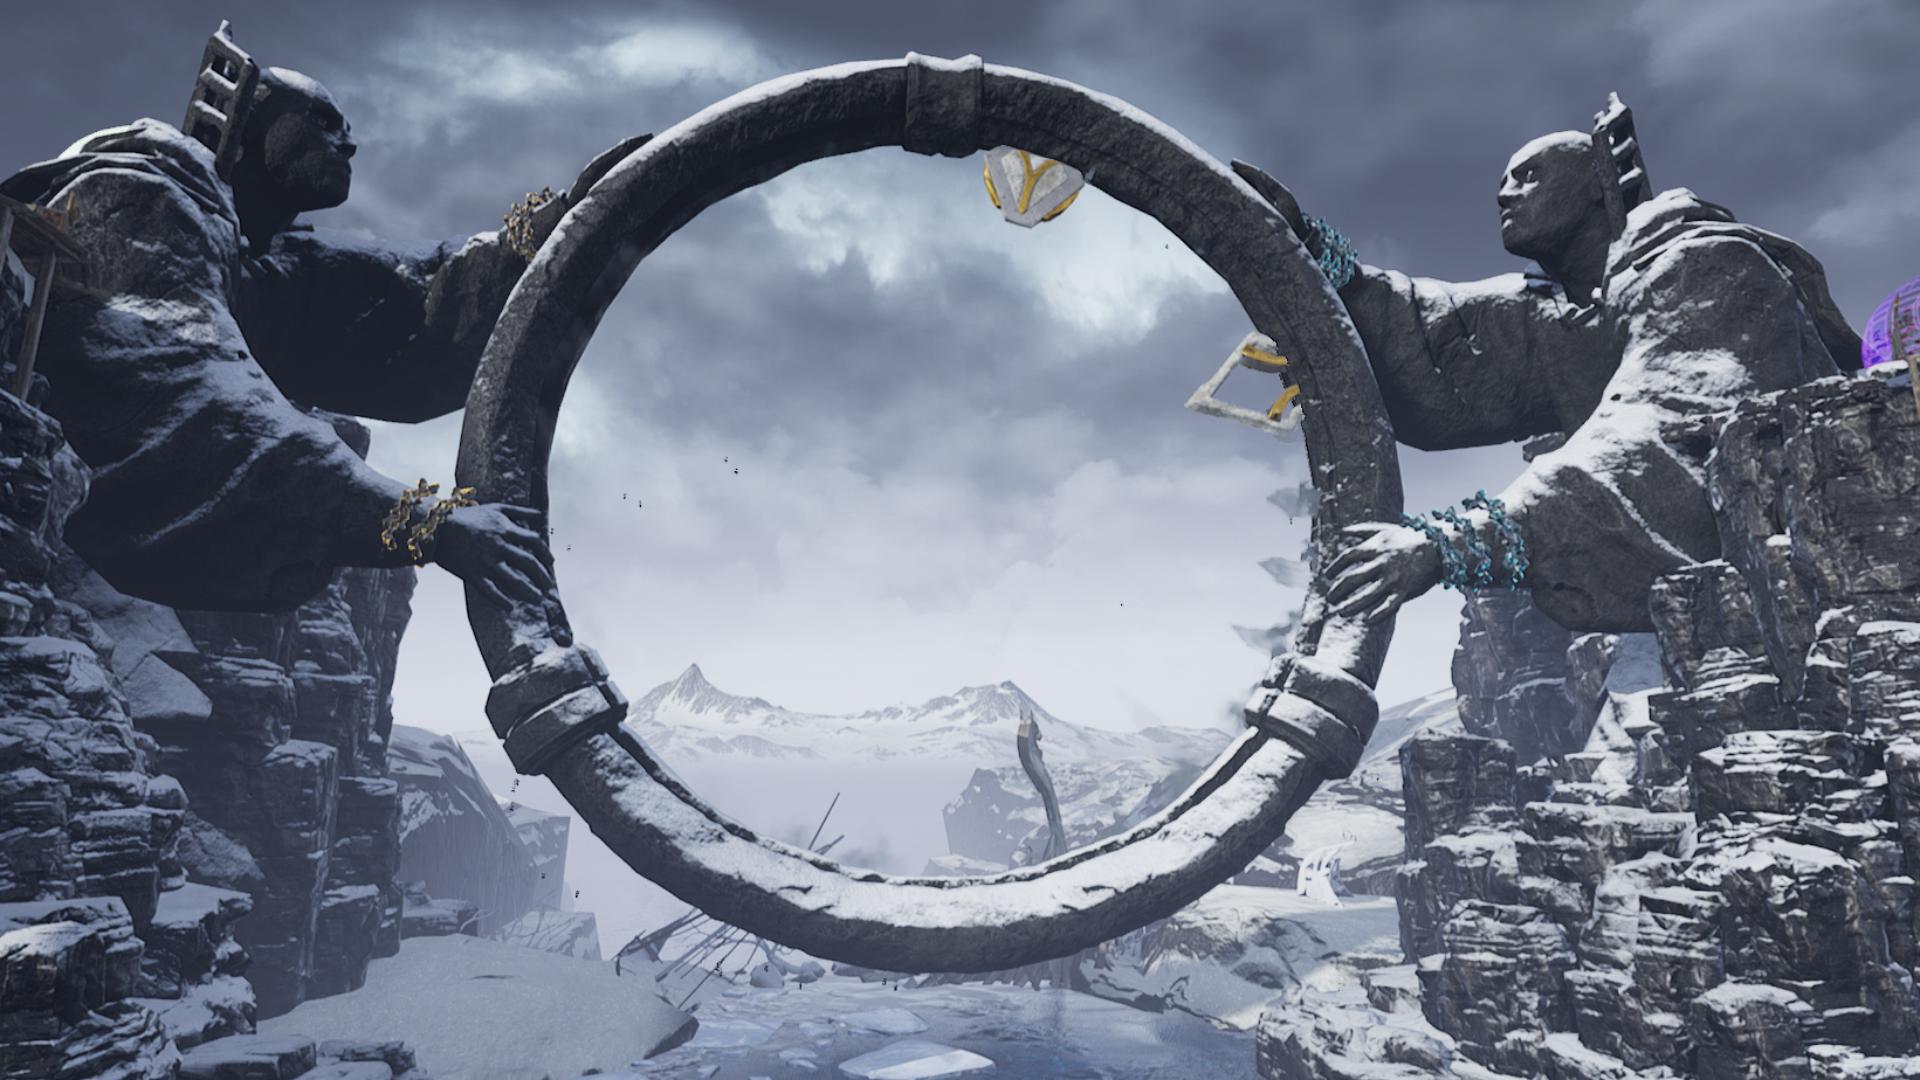 【Asgard's Wrath】攻略法 進行のポイントまとめ11